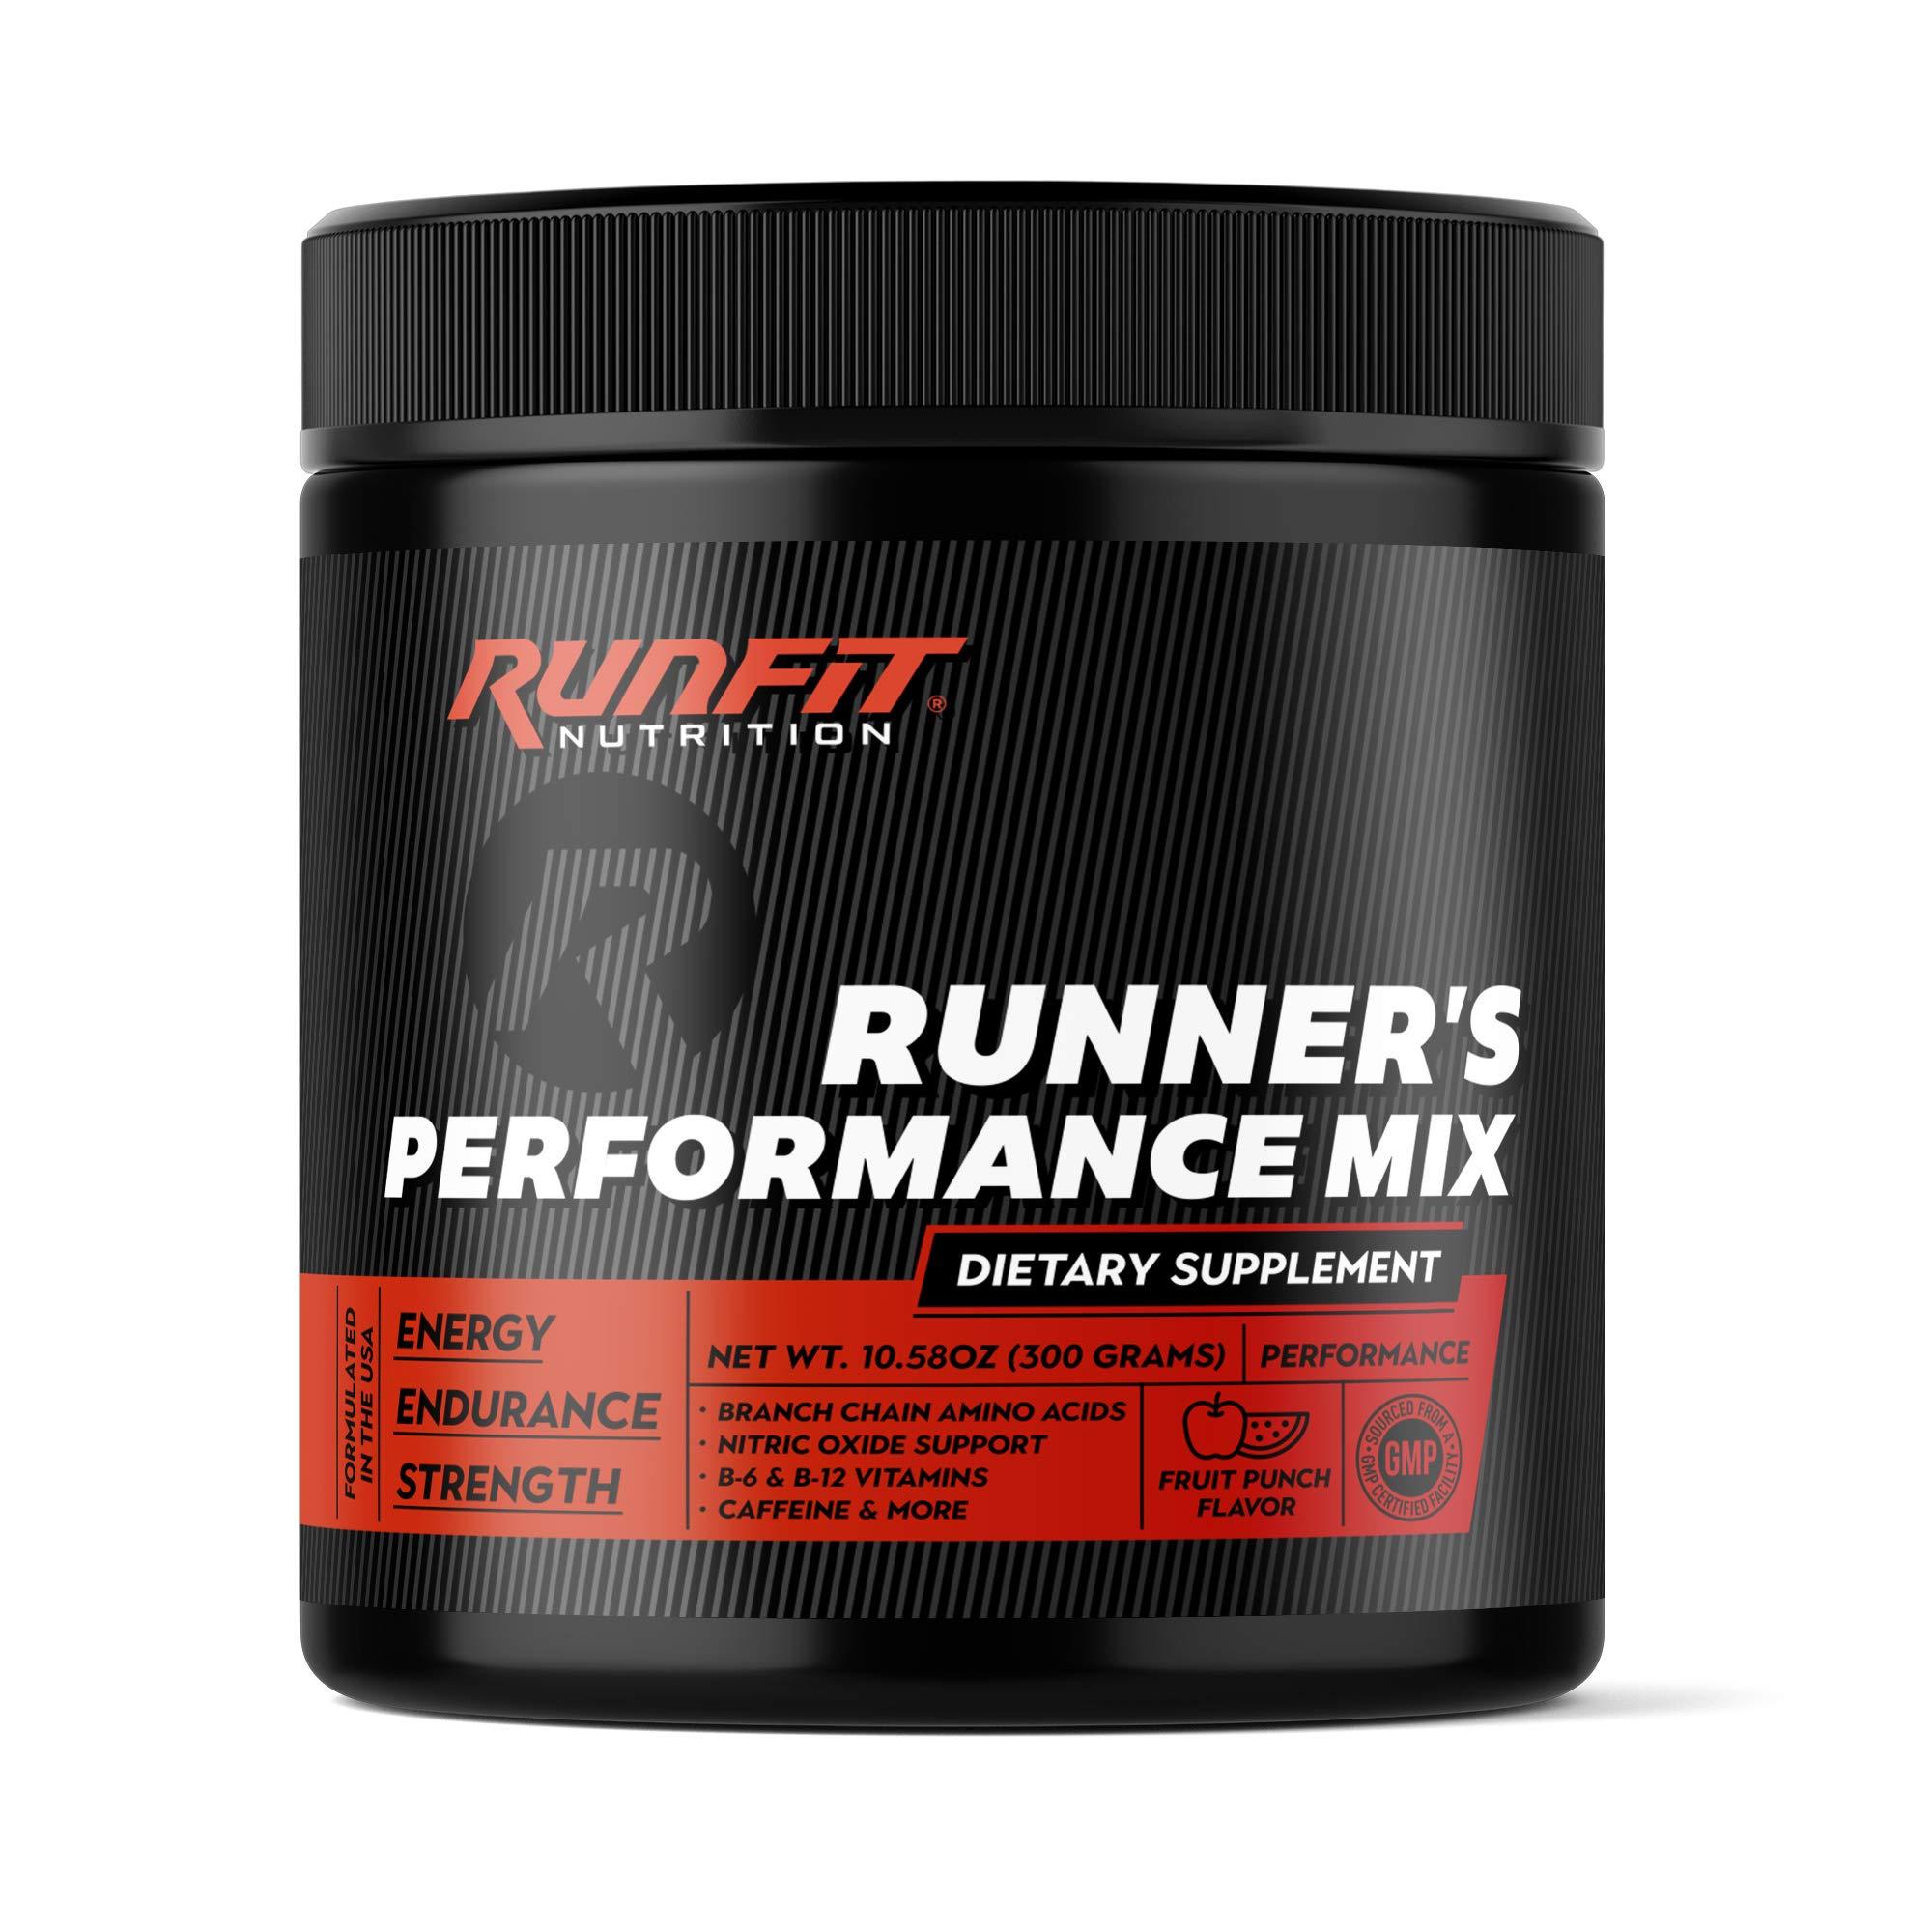 Runner's Performance Mix - Energy & Endurance Powder - Keto Friendly - Low Carb & Low Calorie - Vitamins, BCAAs, Caffeine & More - Fruit Punch - 30 Servings!